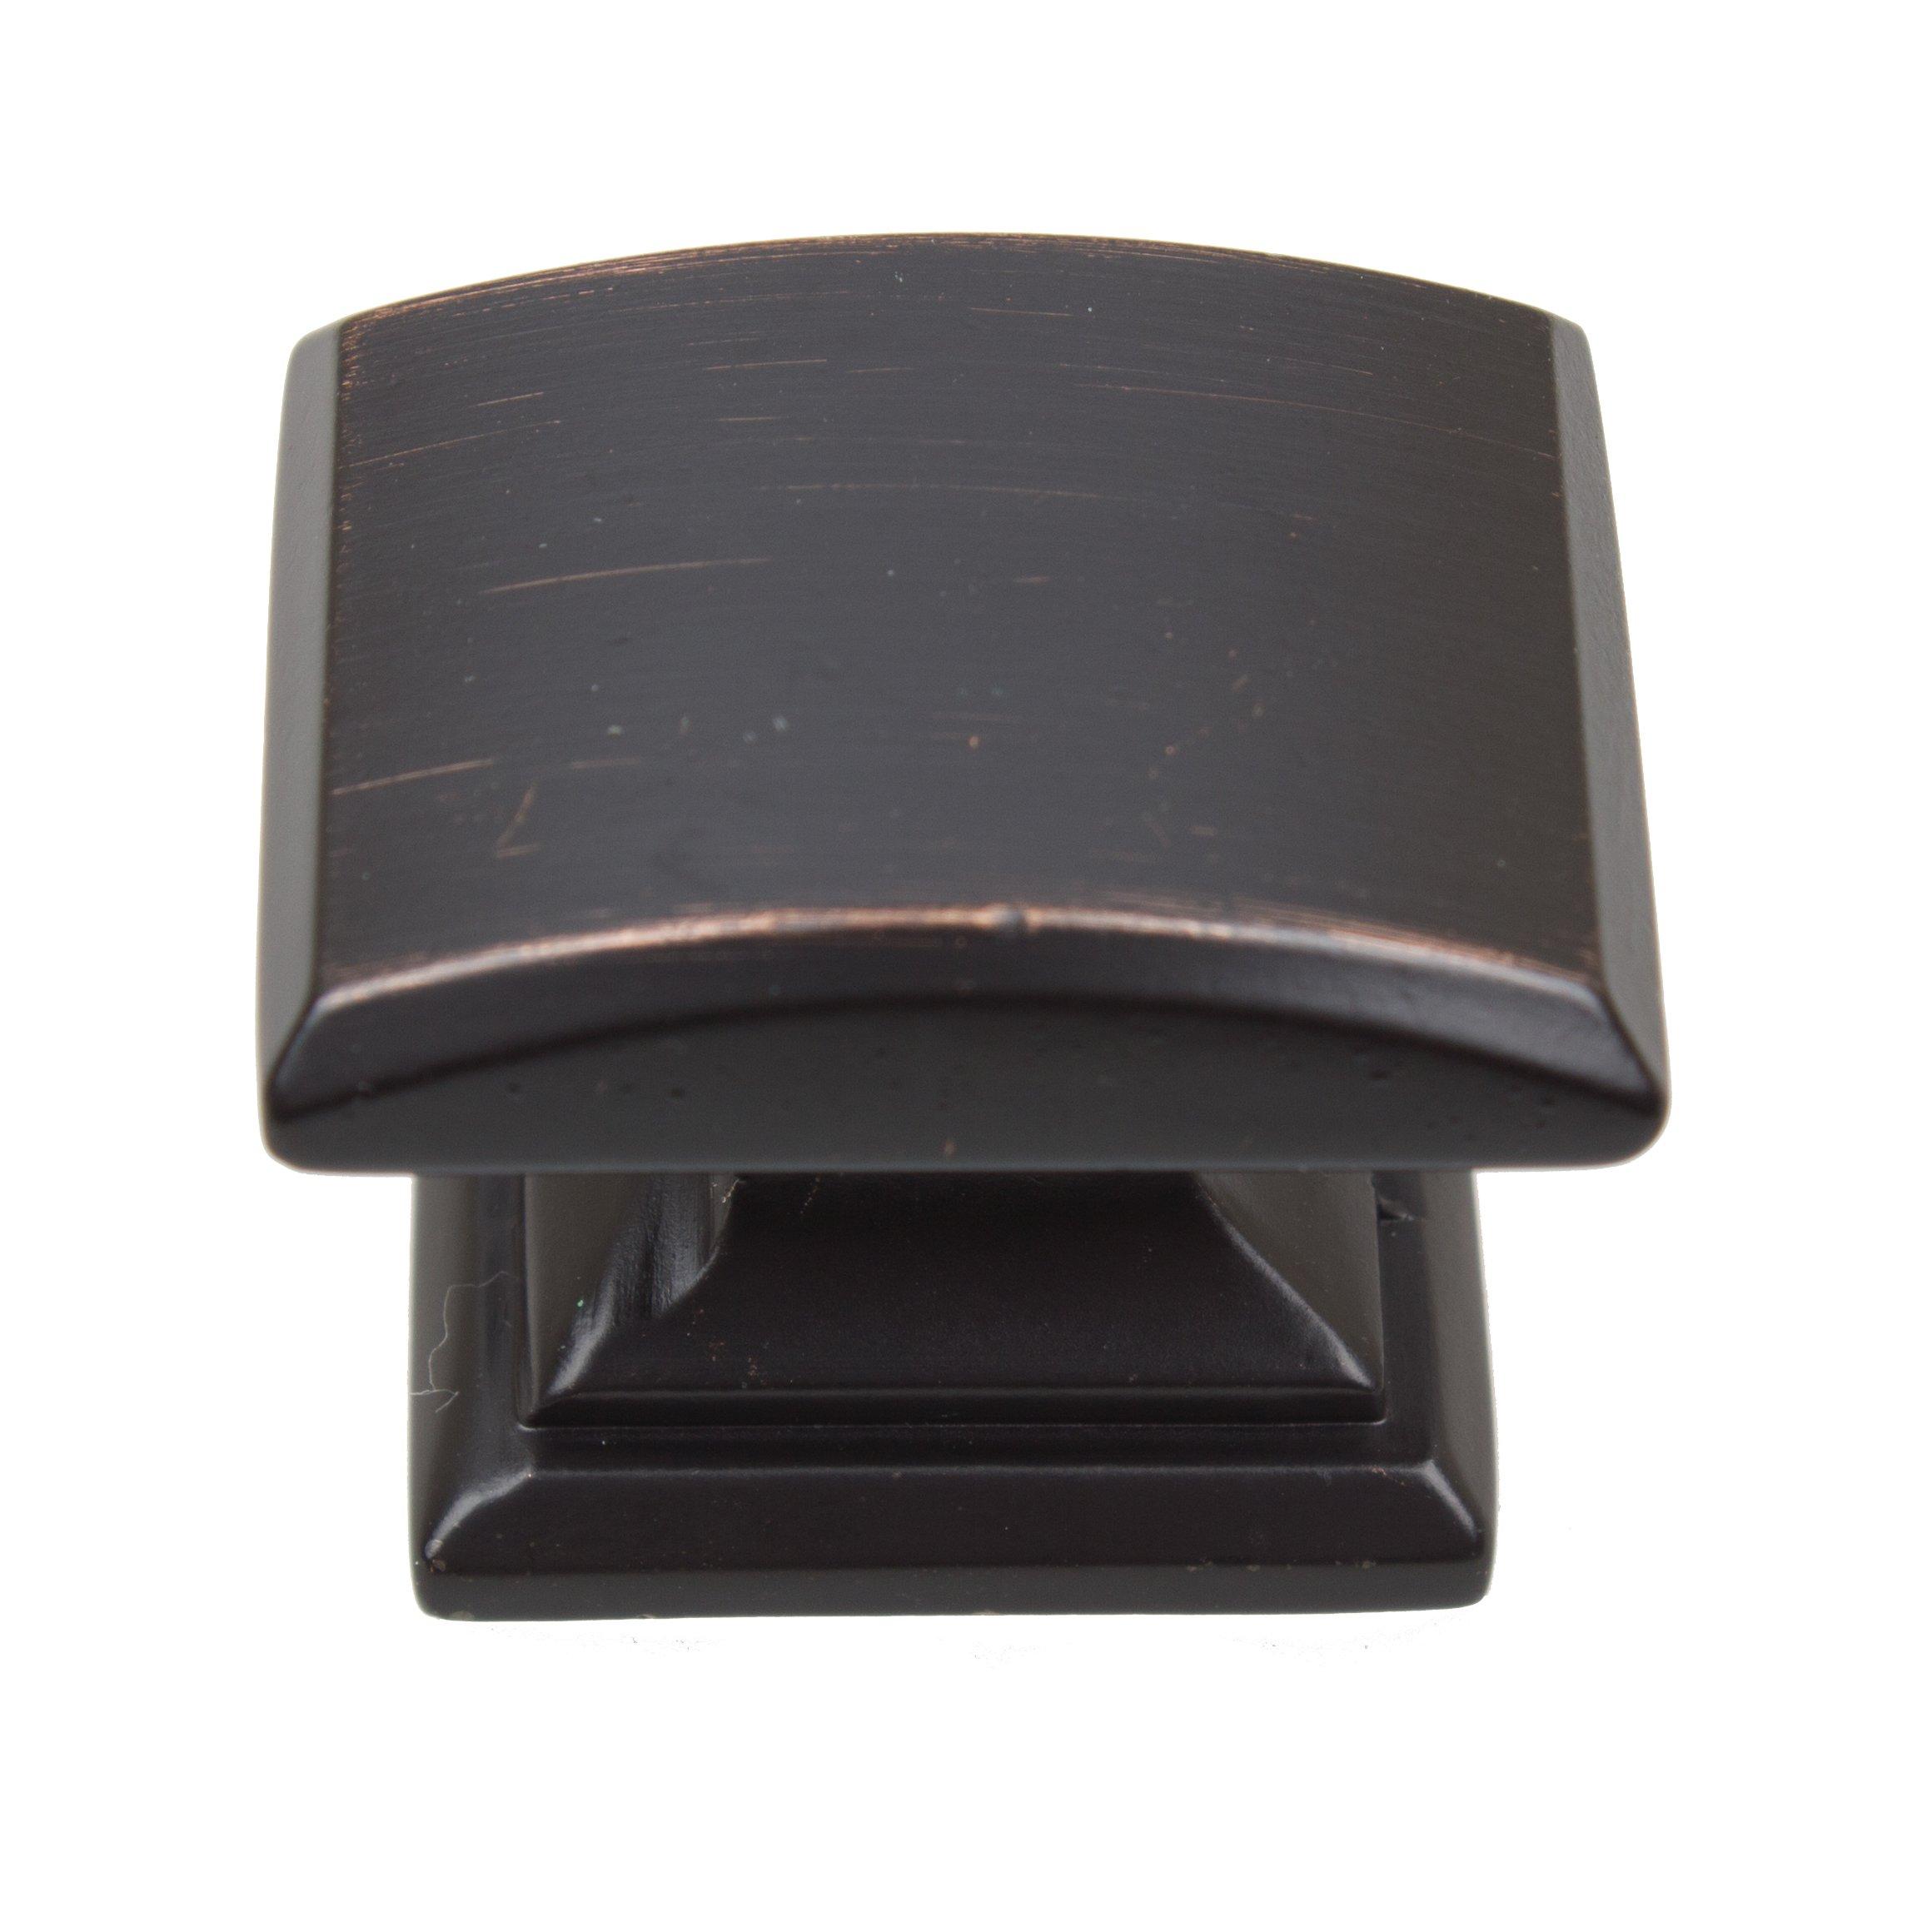 GlideRite Hardware 5740-ORB-10 1.25 inch Domed Convex Square Oil Rubbed Bronze Cabinet Knobs 10 Pack by GlideRite Hardware